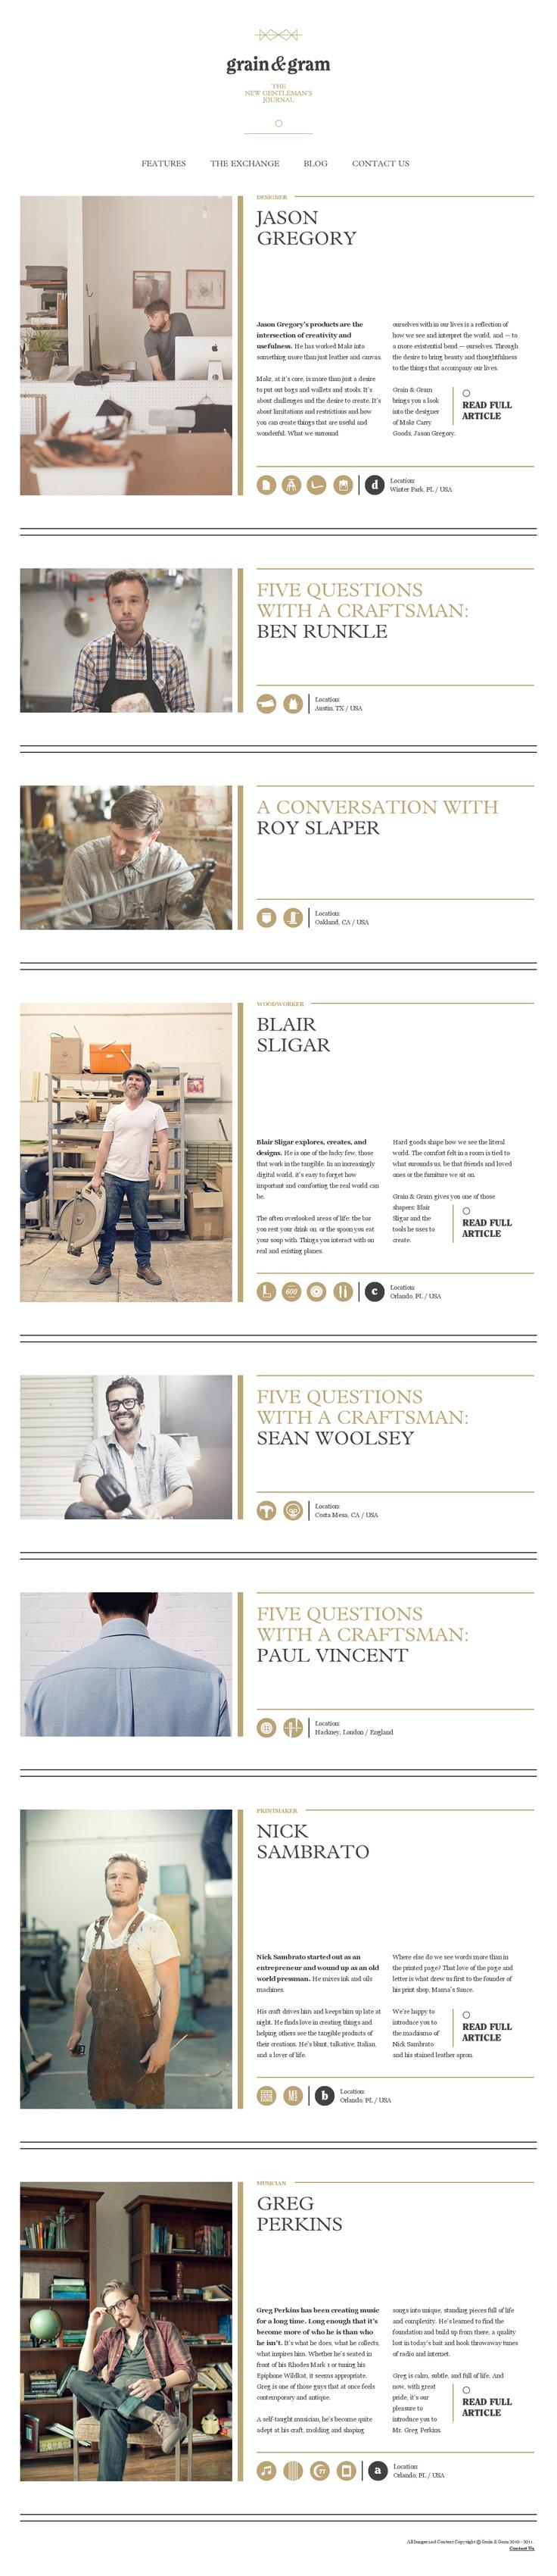 Stylish gentleman's site: Webdesign, Website Http Grainandgram Com, Favorite Website, Favourit Website, Website Design